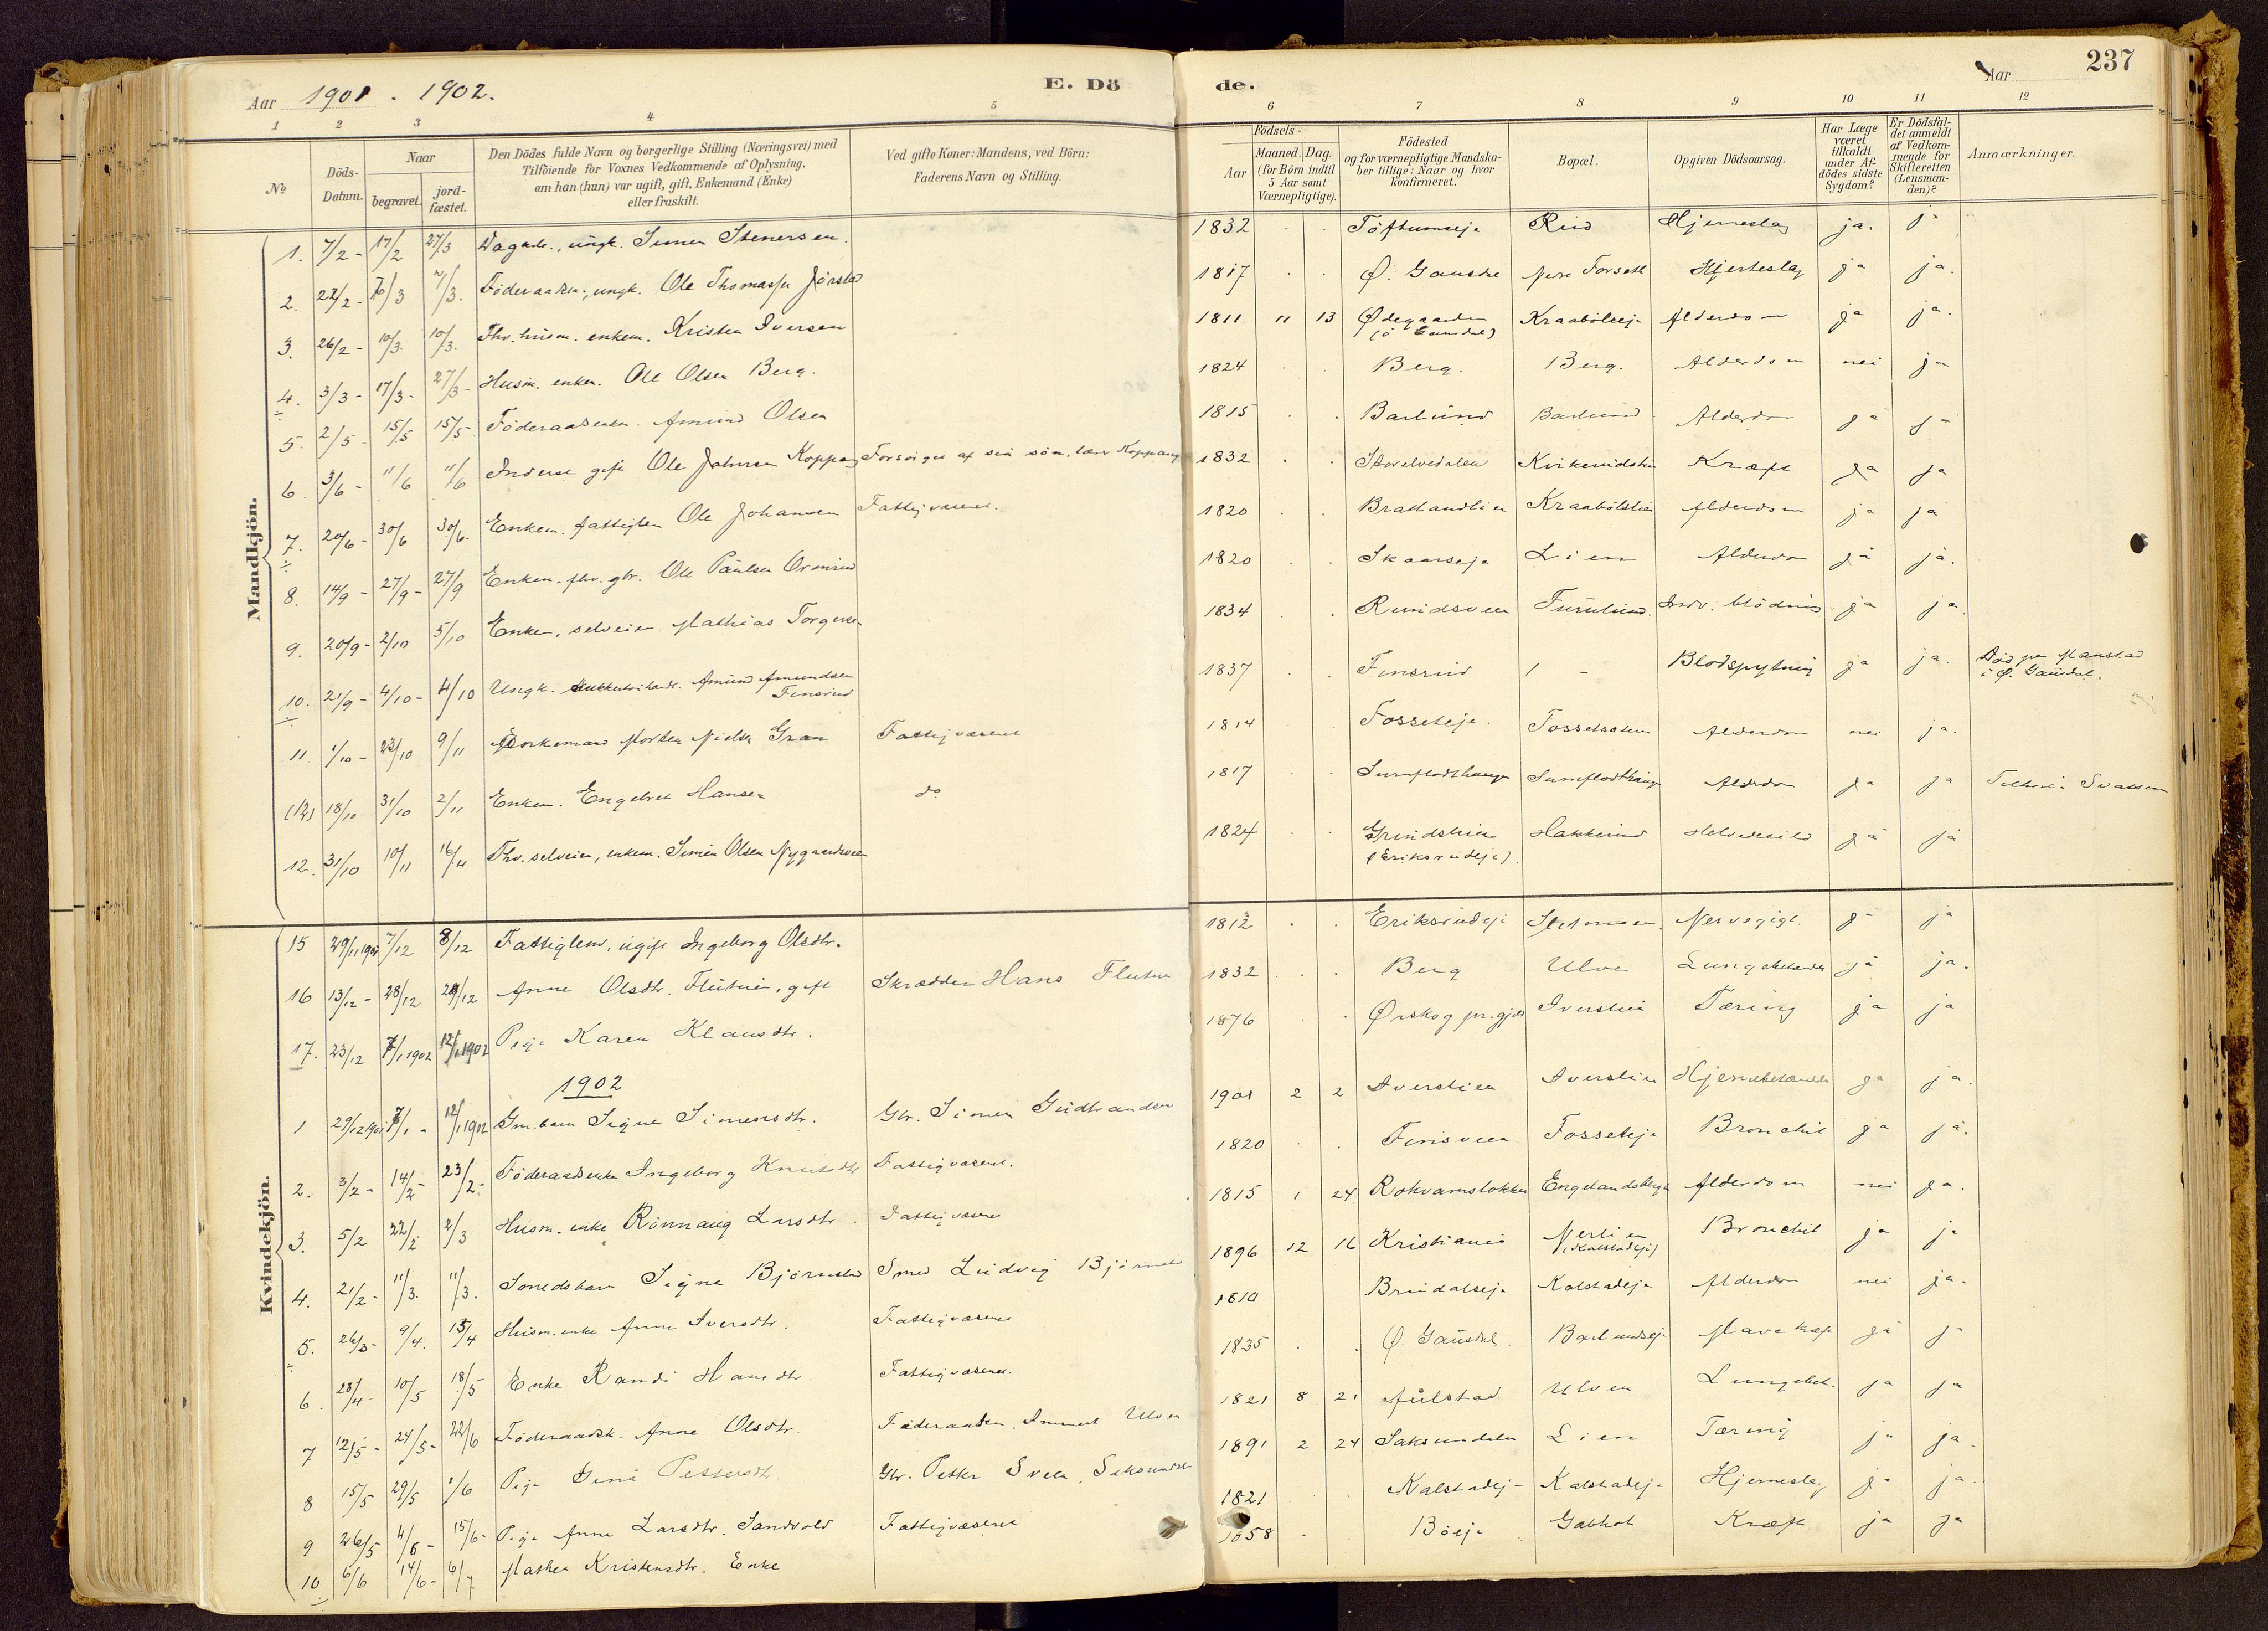 SAH, Vestre Gausdal prestekontor, Ministerialbok nr. 1, 1887-1914, s. 237